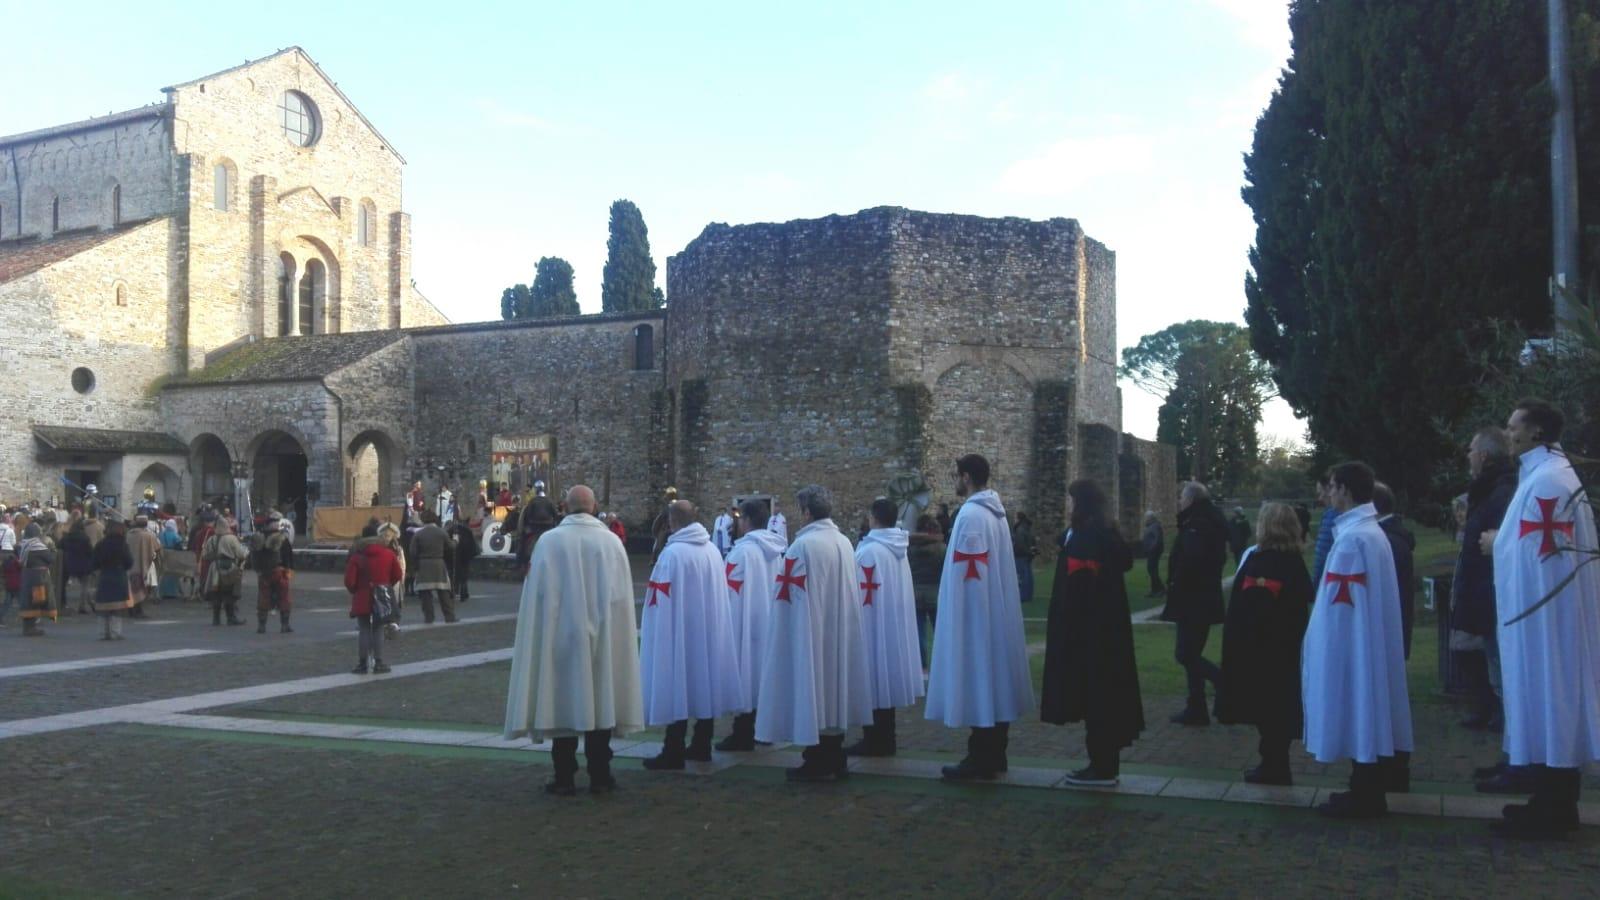 Santa Messa Domenicale e custodia alla Basilica Santa Maria Assunta e Battistero di Aquileia (UD) (2019)